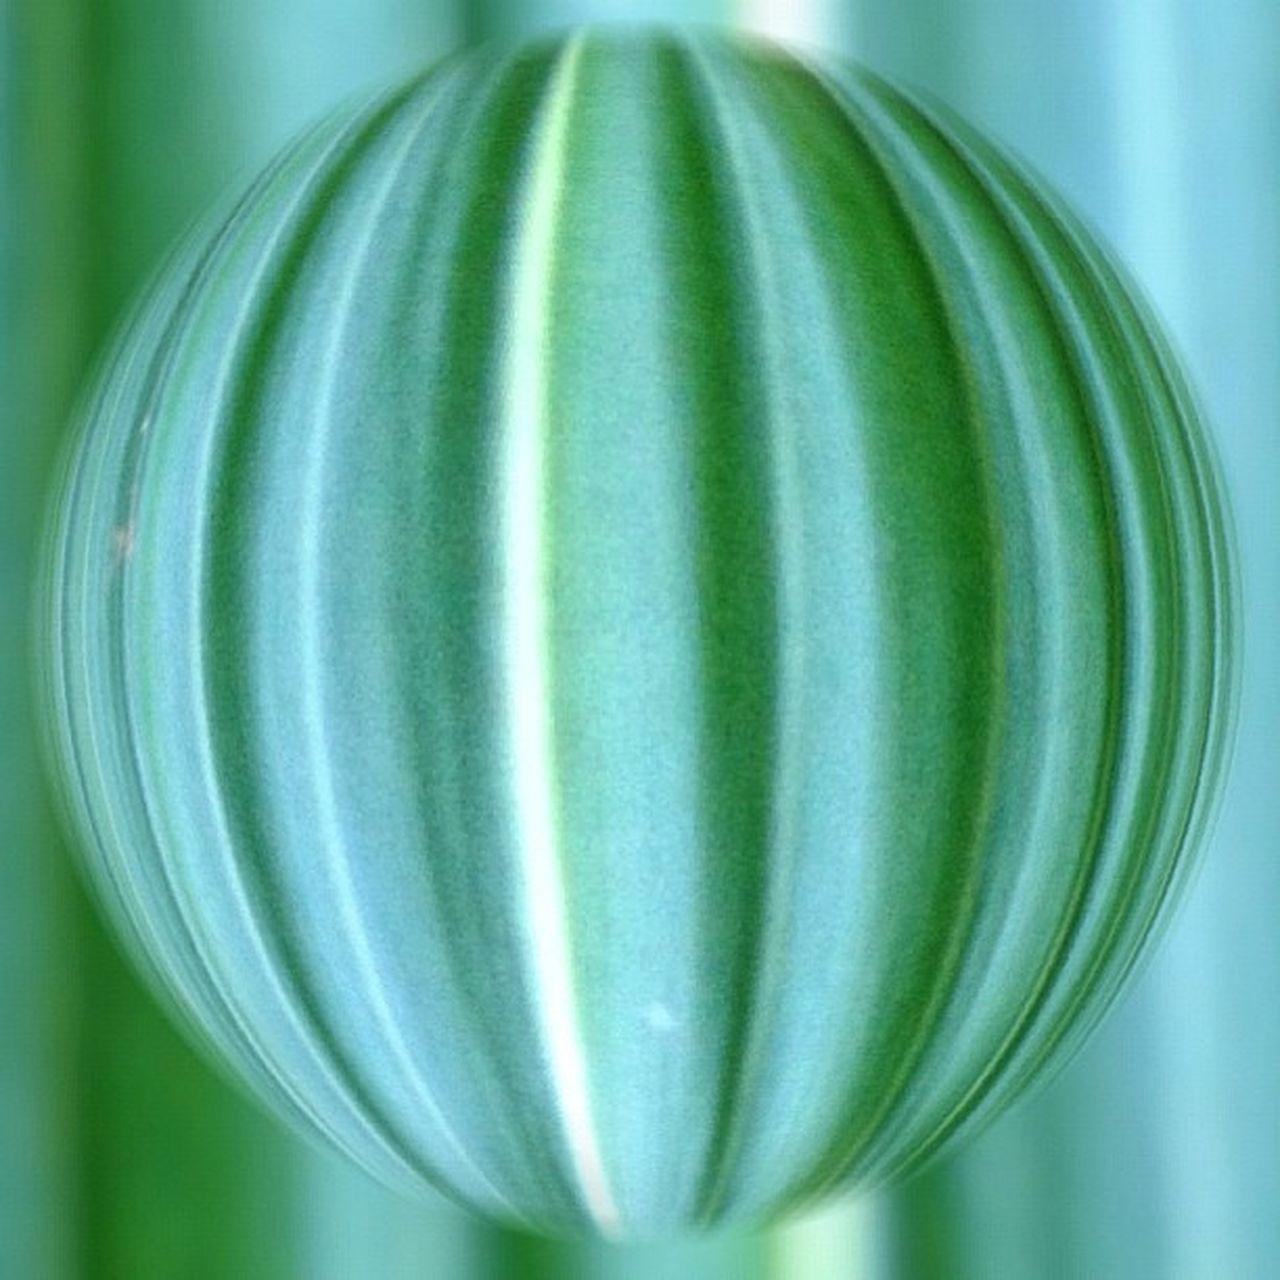 Marble leaf..#marblecam #leaves #leaf #improvedimage #green Leaf Green Leaves Marblecam Improvedimage